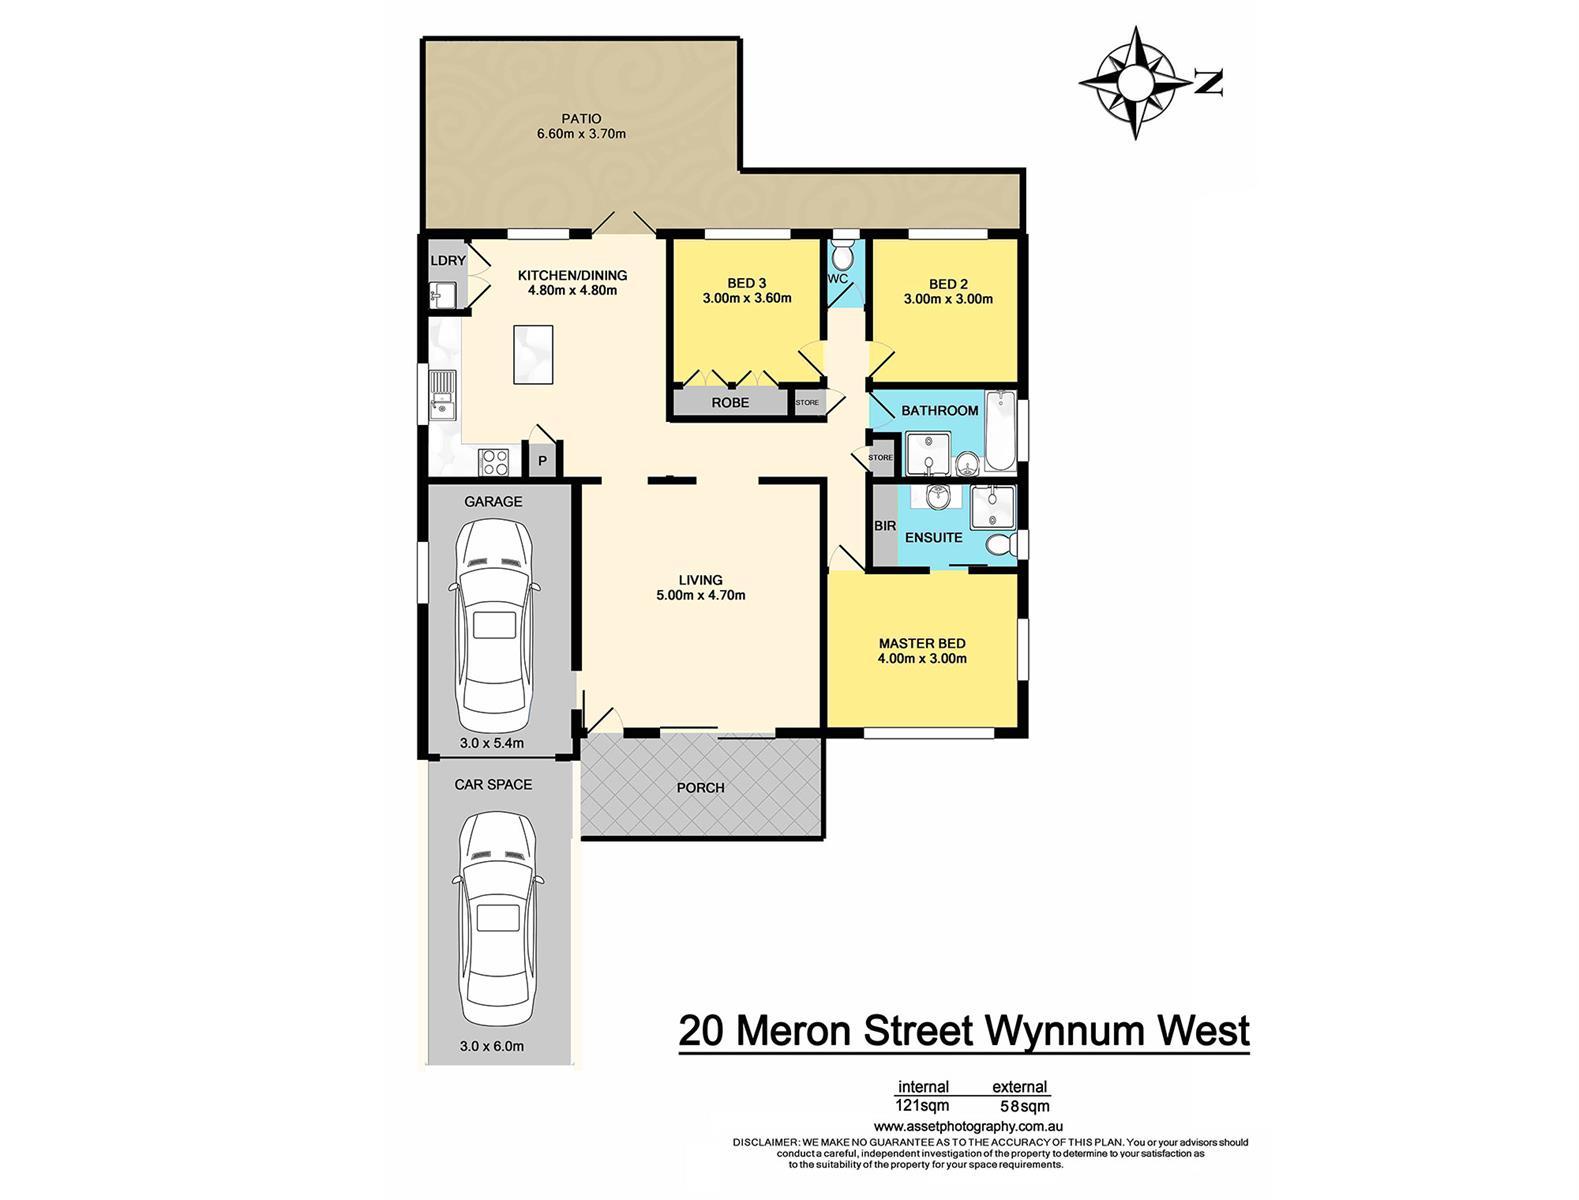 20 Meron St WYNNUM WEST QLD 4178 Floorplan 1